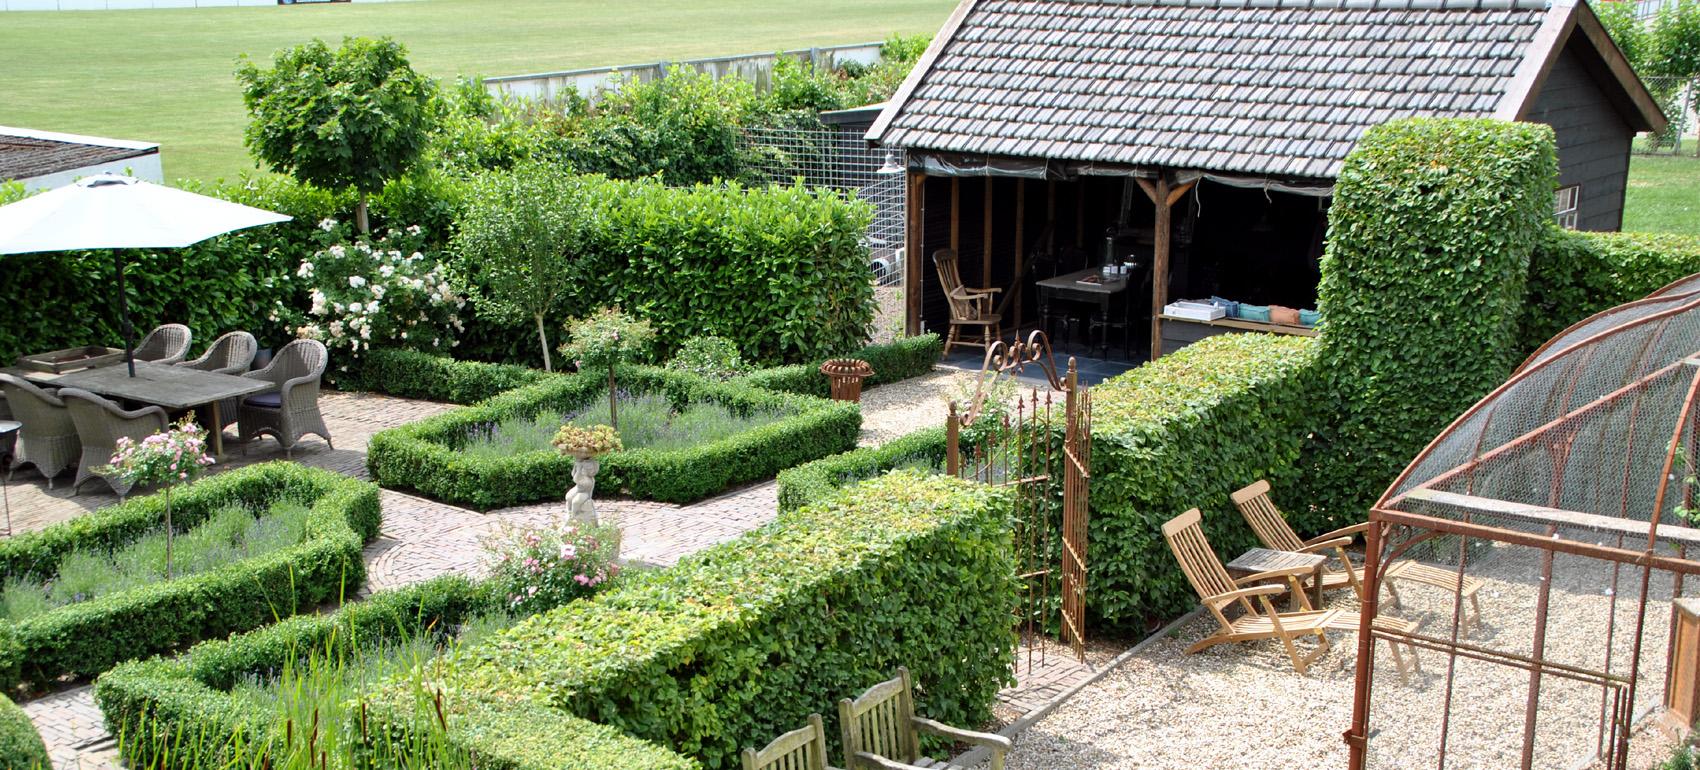 Tuinaanleg Van der Waal Tuinen - Franse / brocante tuin